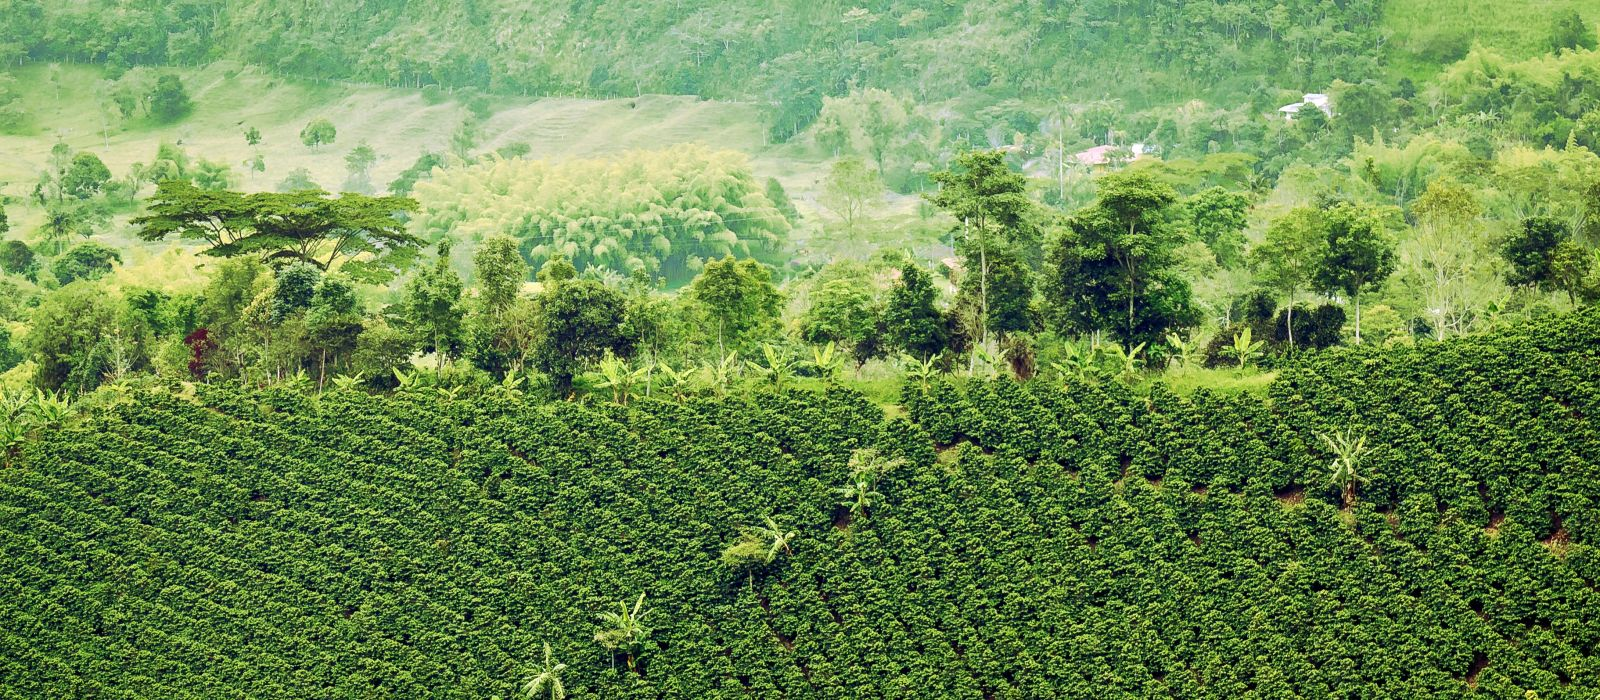 Reiseziel Armenia Kolumbien